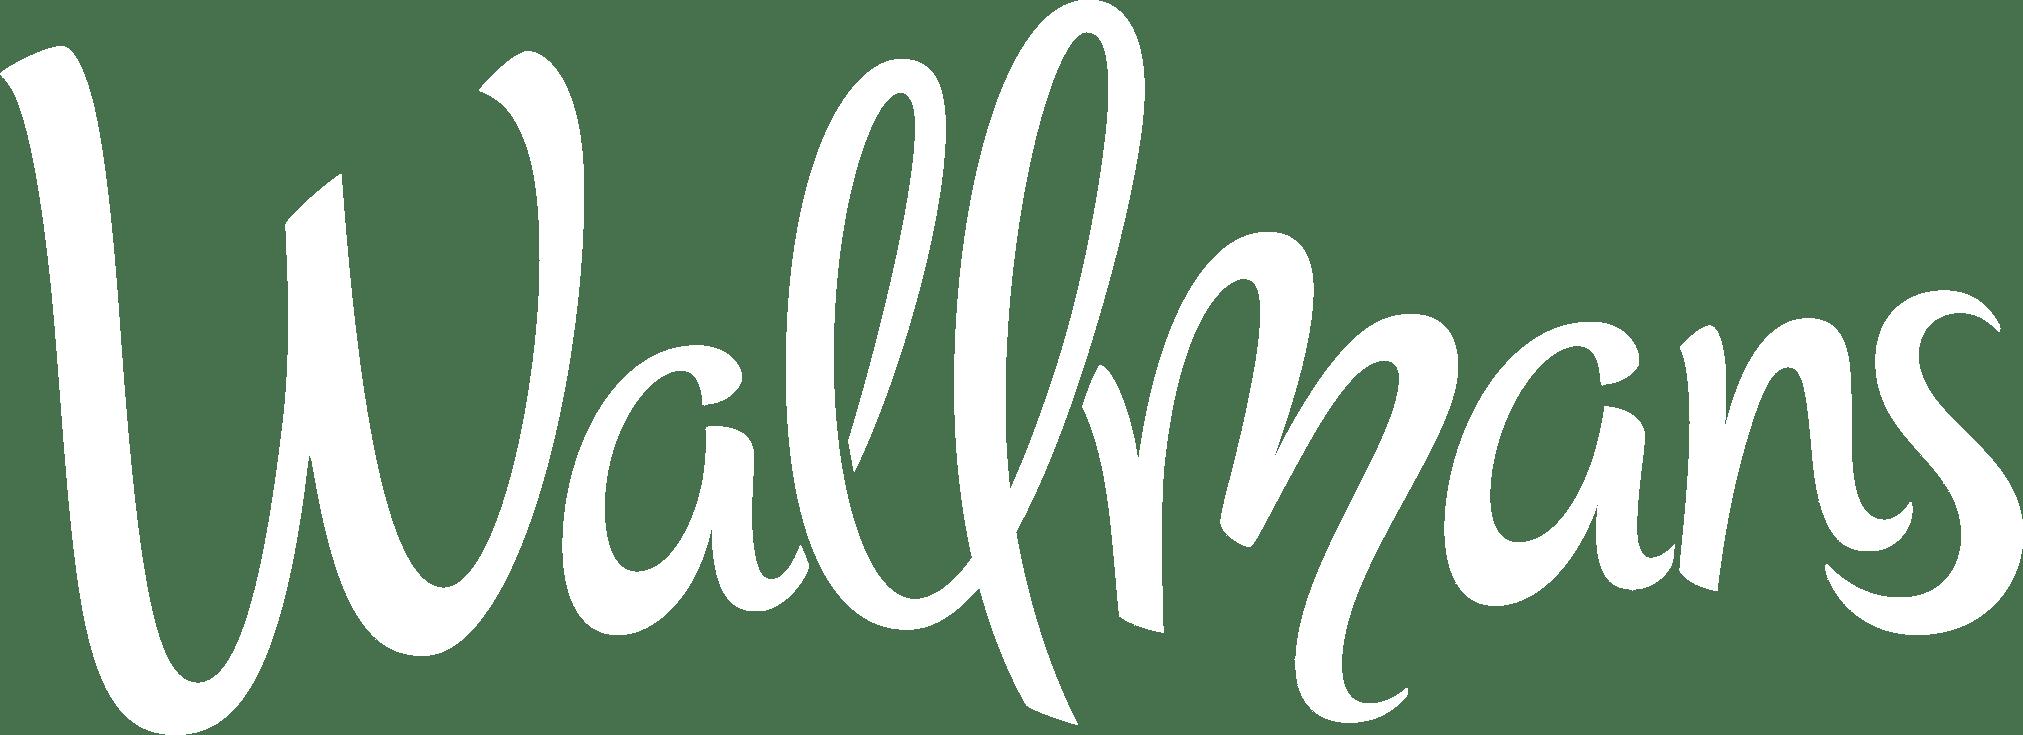 wallmans-stockholm-vit.png